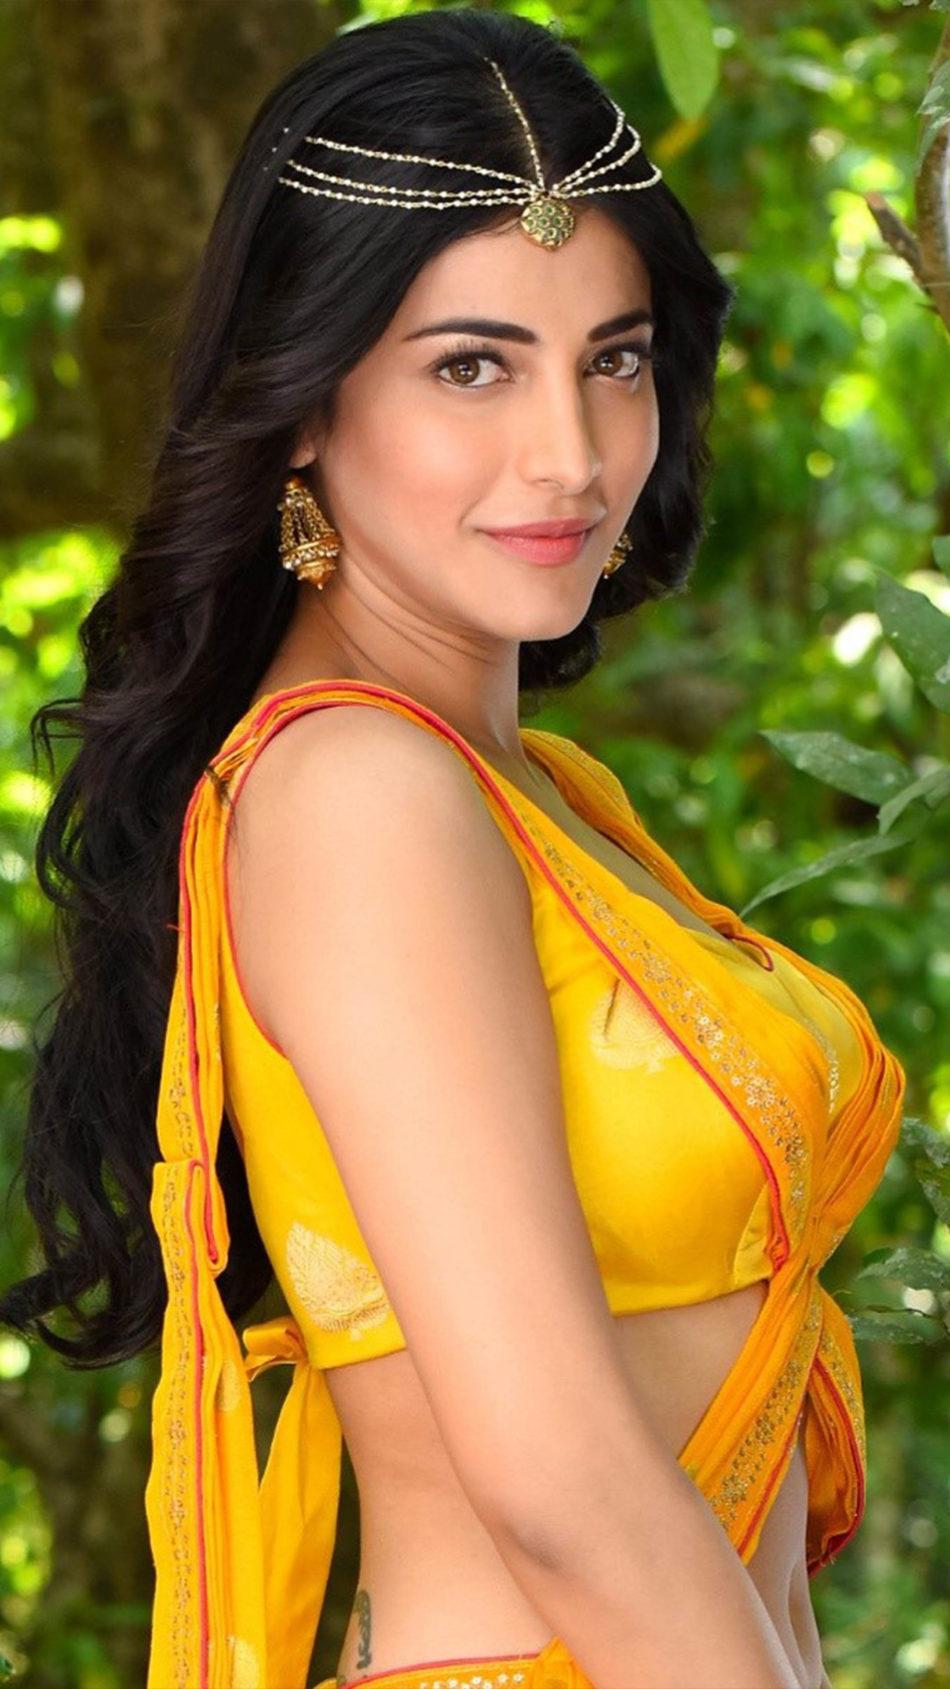 Shruti Haasan In Beautiful Yellow Dress 4K Ultra HD Mobile Wallpaper